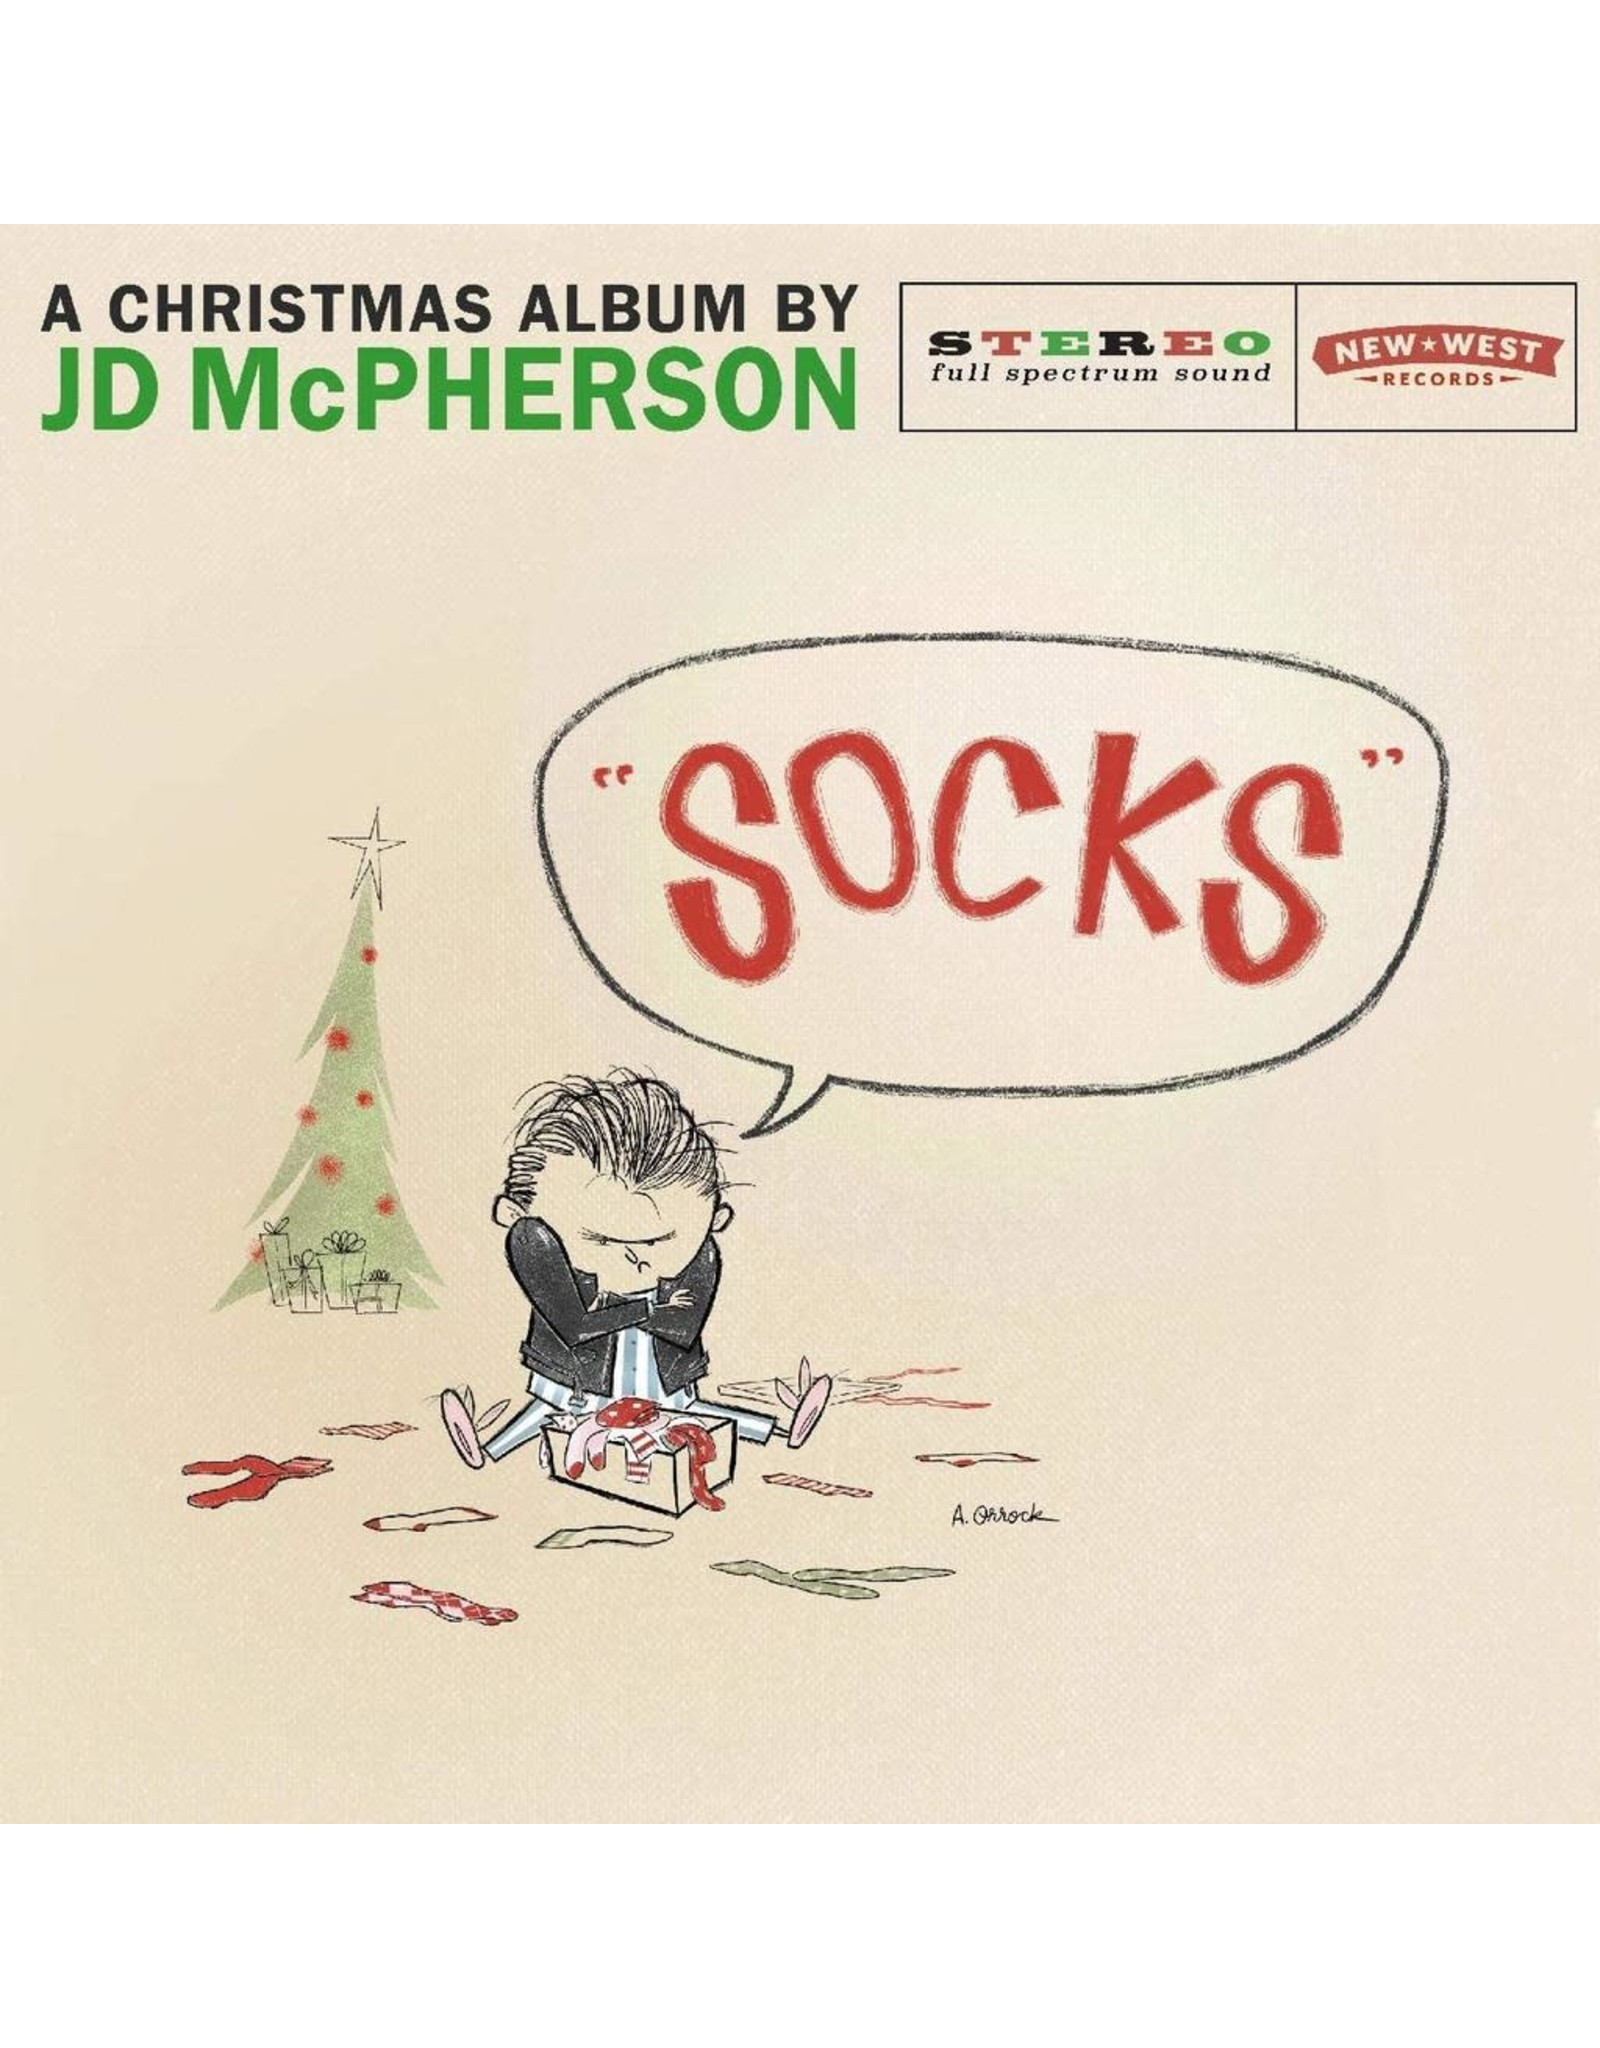 JD McPherson - Socks (Exclusive Snow Globe Vinyl)